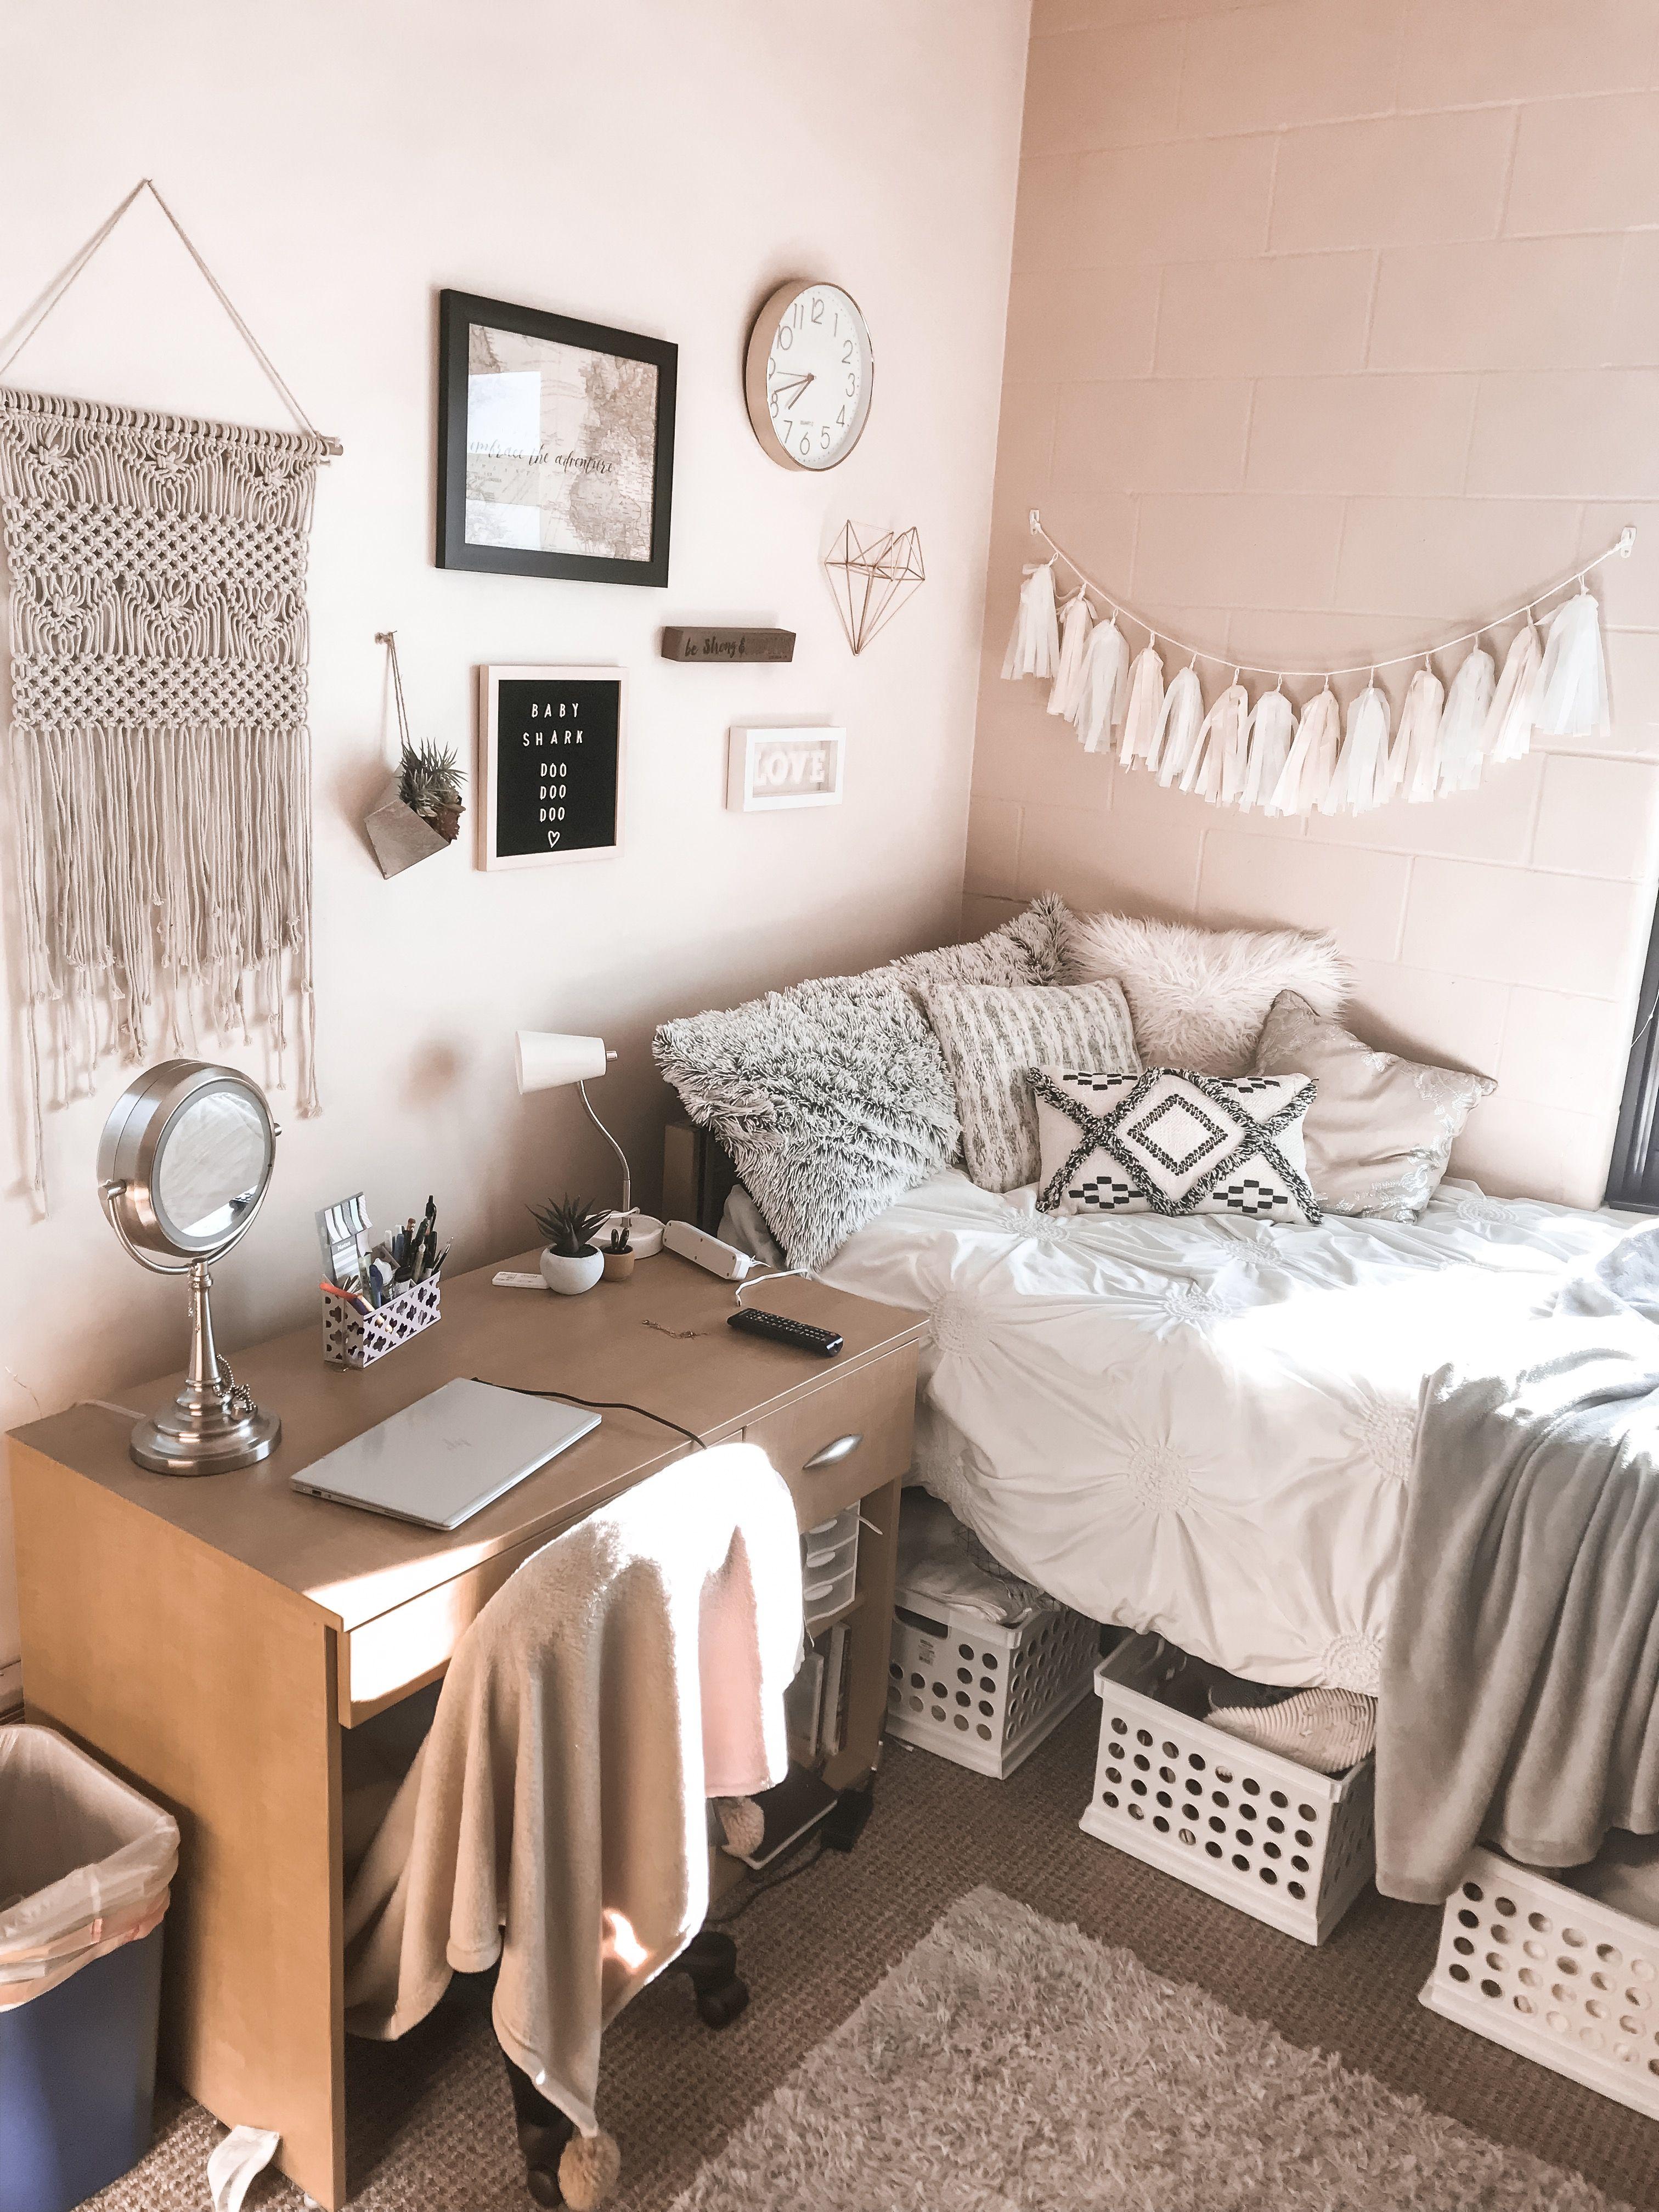 Dorm Room Decor Ideas #collegedormroomideas